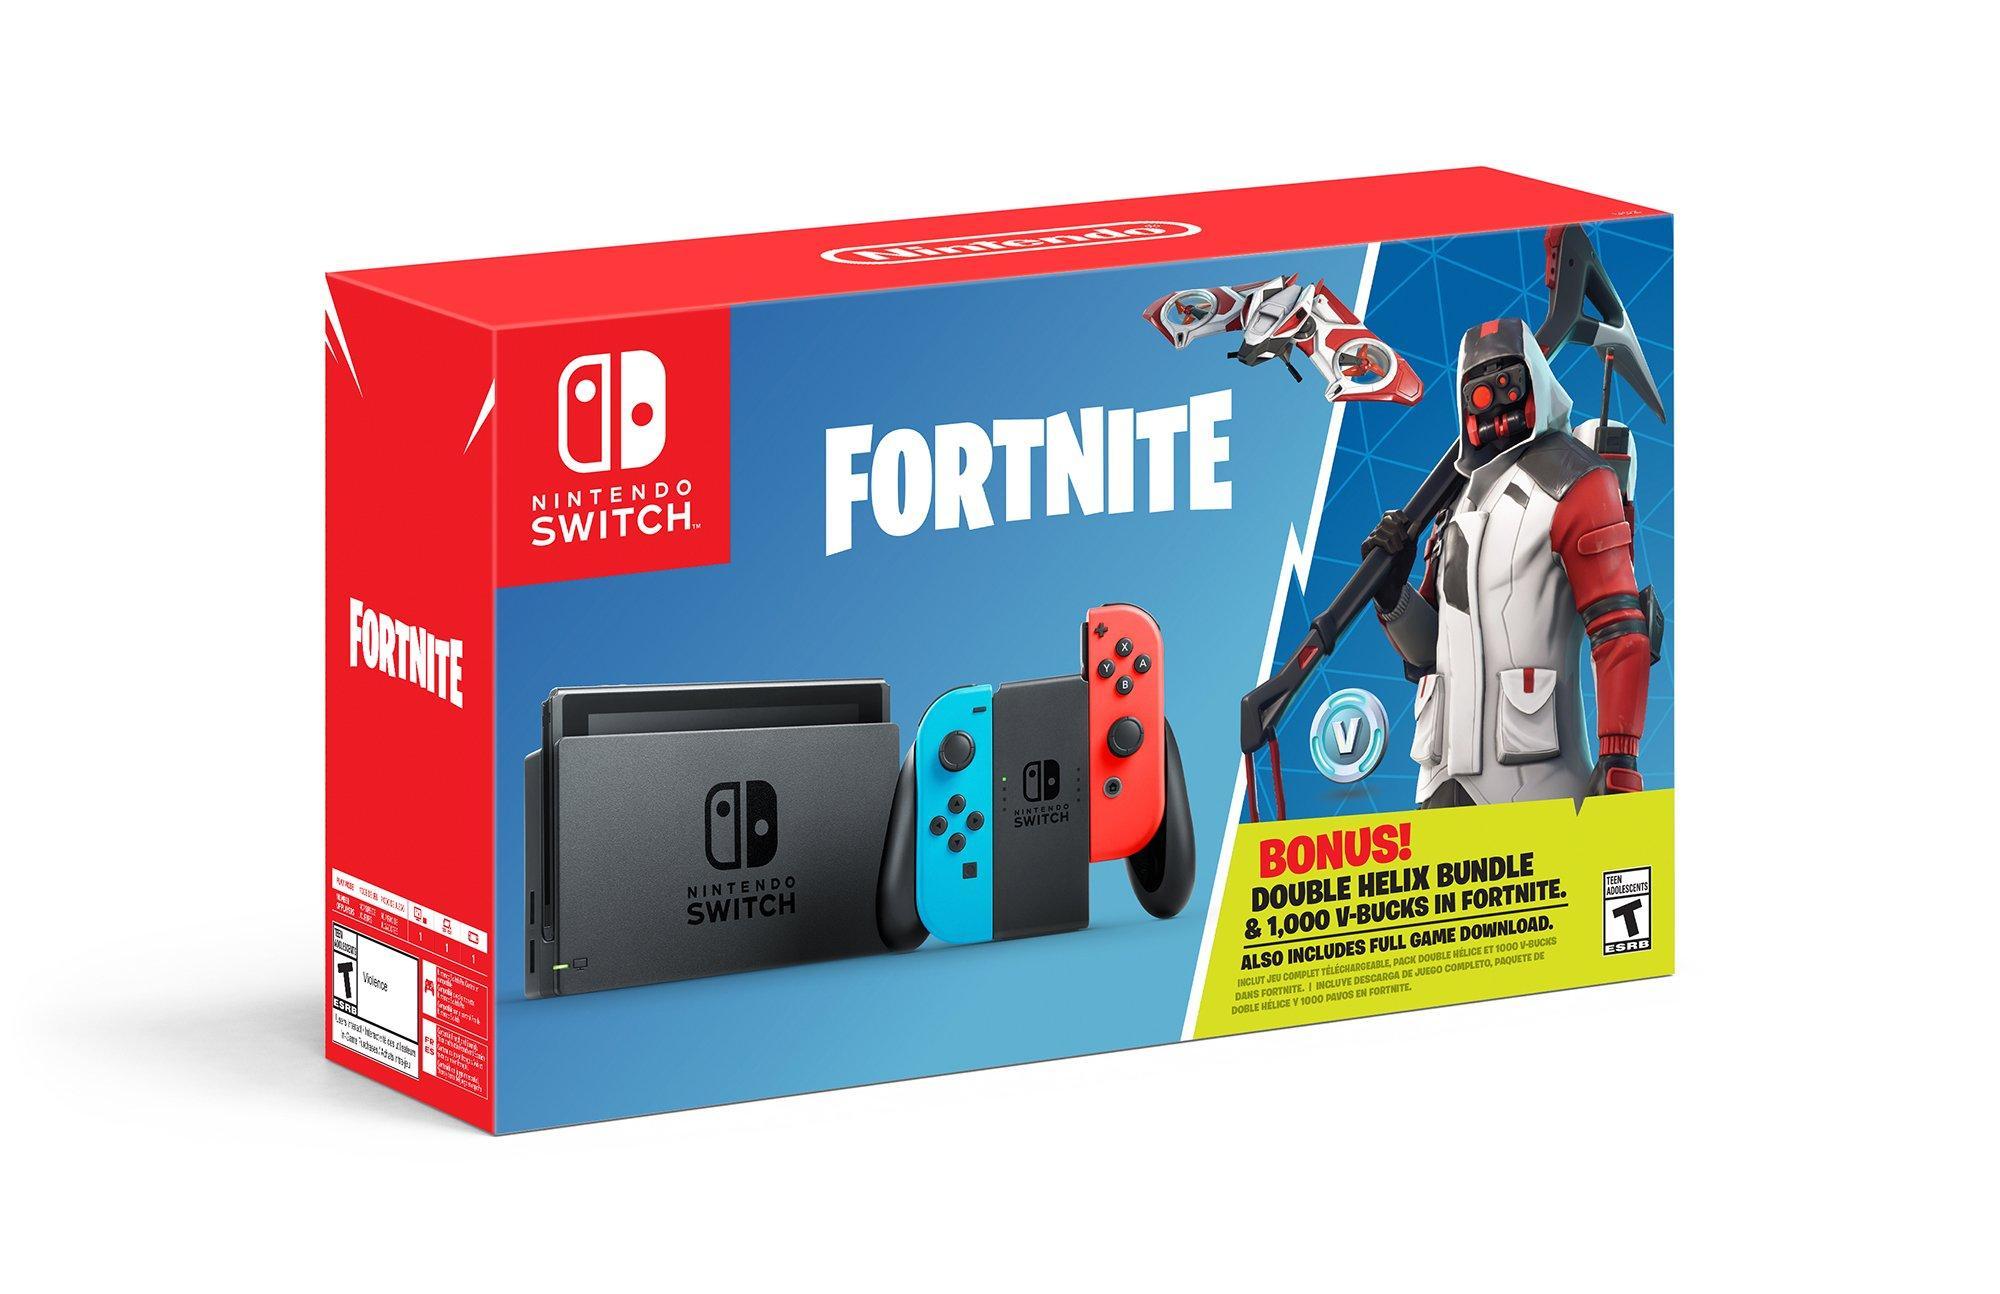 Nintendo Switch Fortnite Double Helix Bundle Nintendo Switch Gamestop